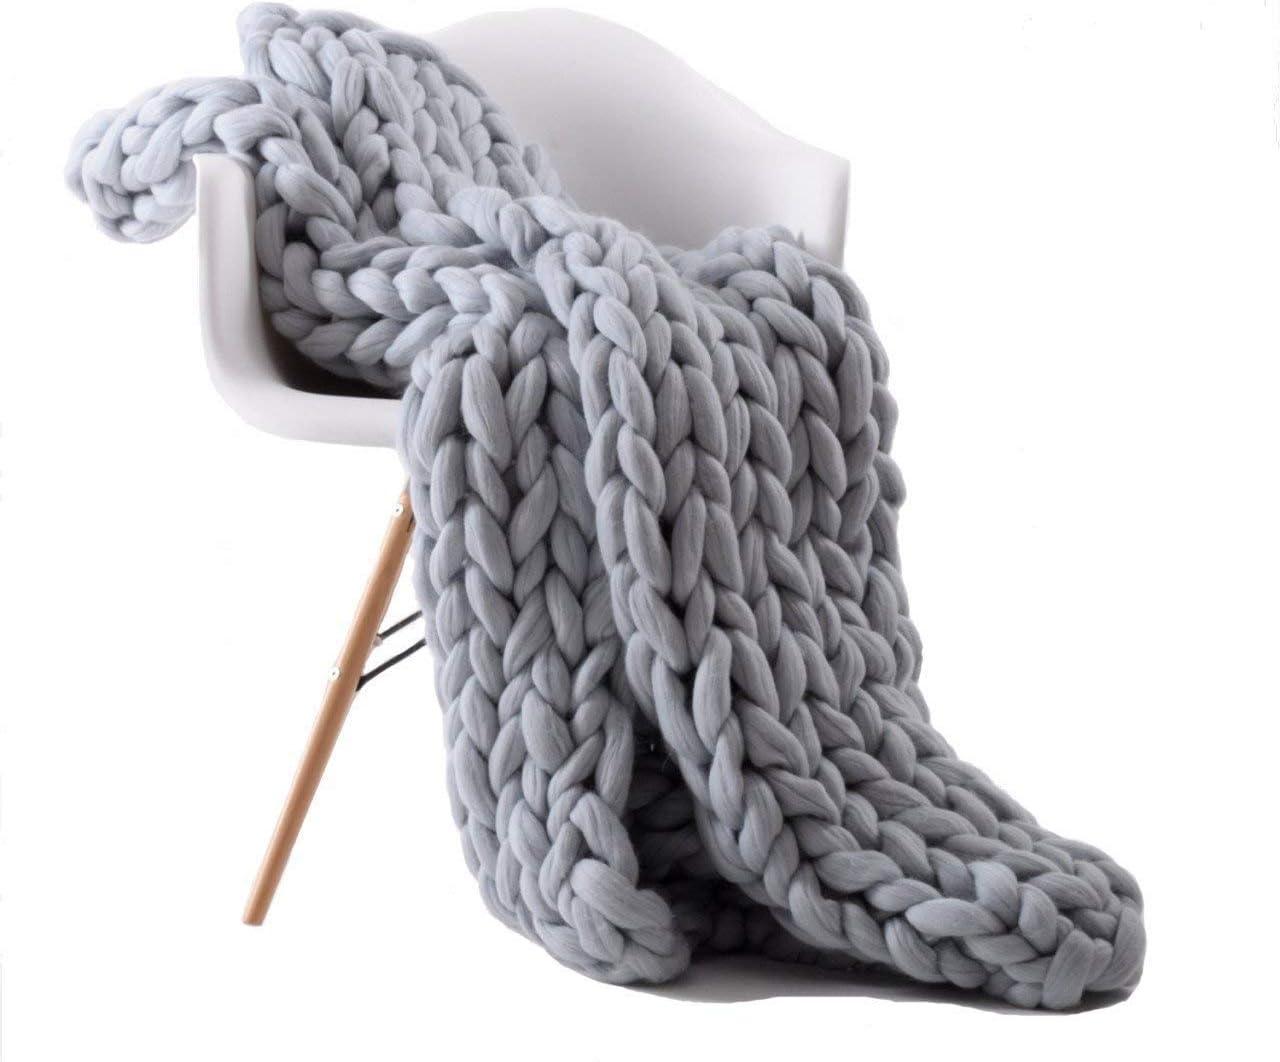 Giant yarnKnit Time sale Blanket Handmade Omaha Mall Thick Bulky Knitting Wool Chunky